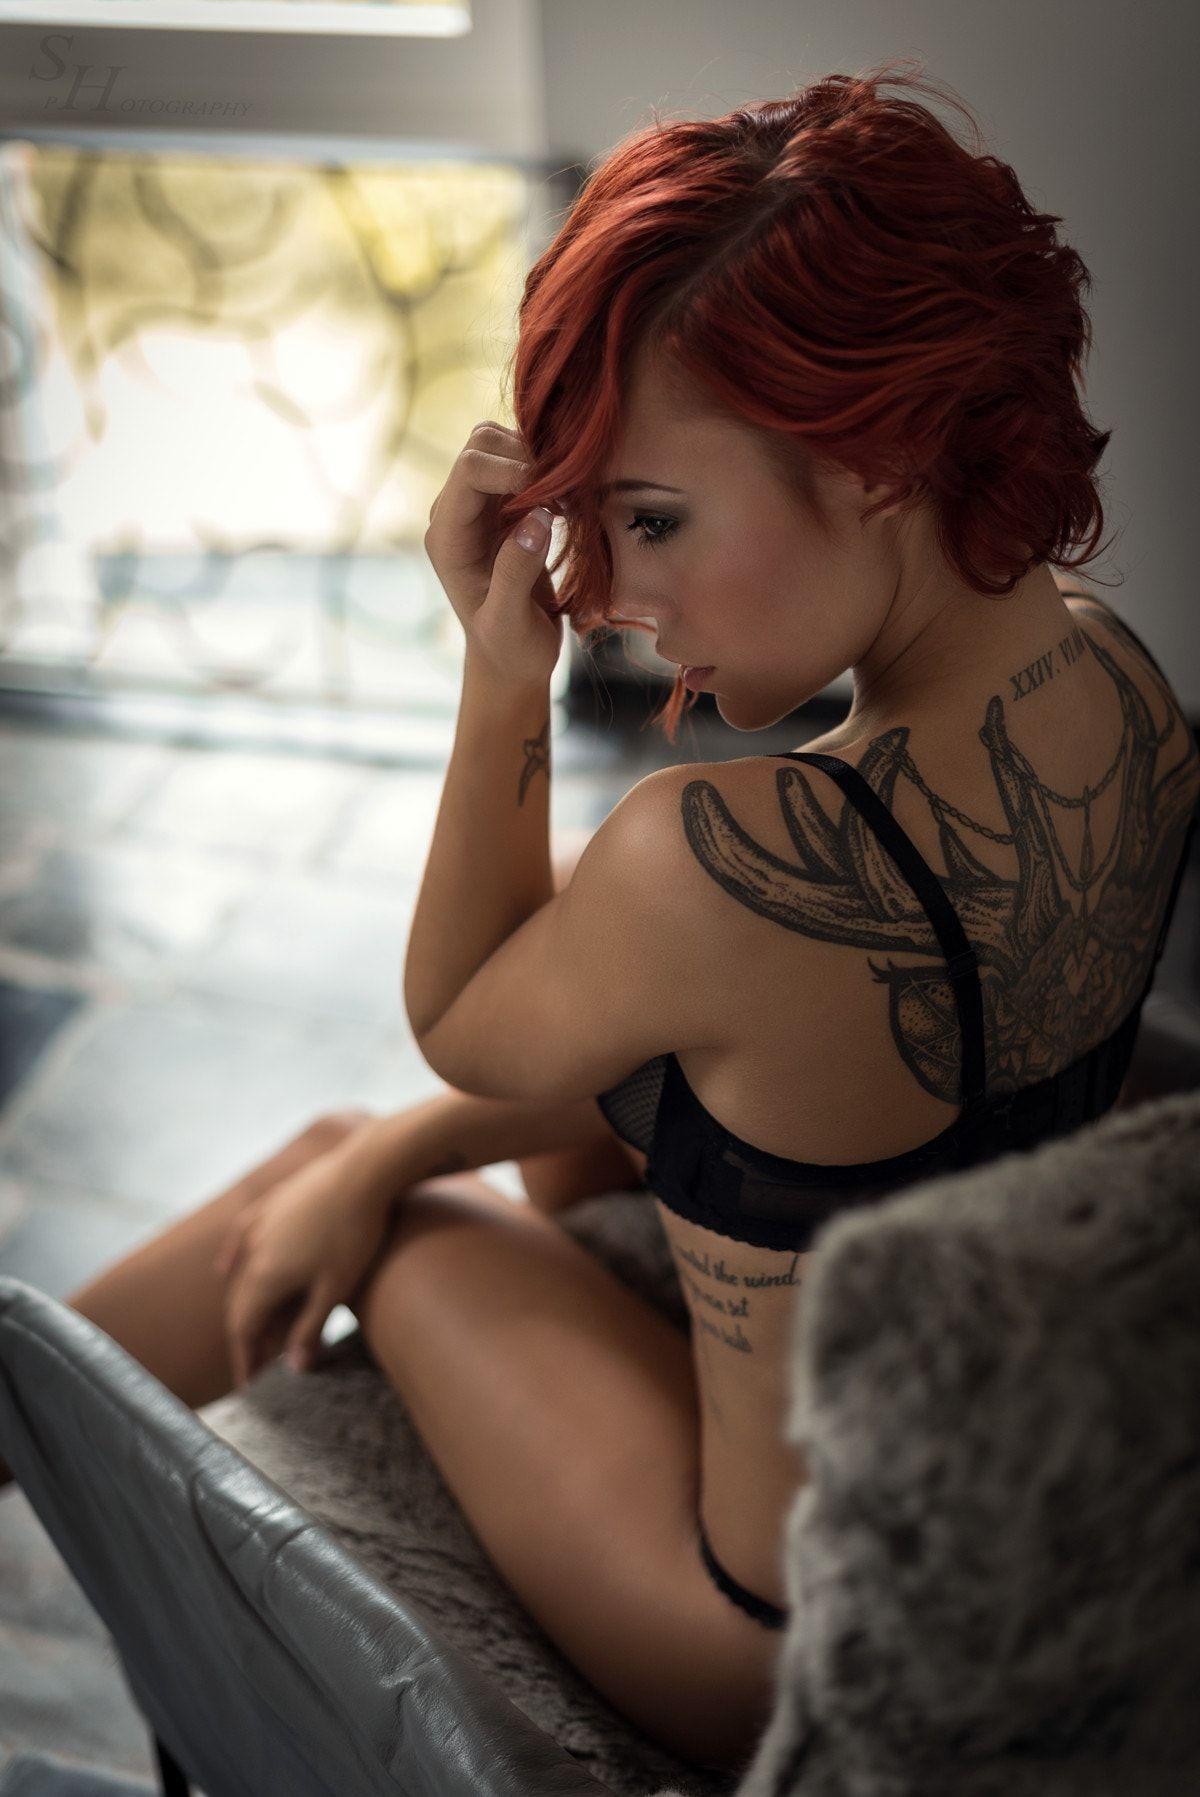 soft porn girl vedio